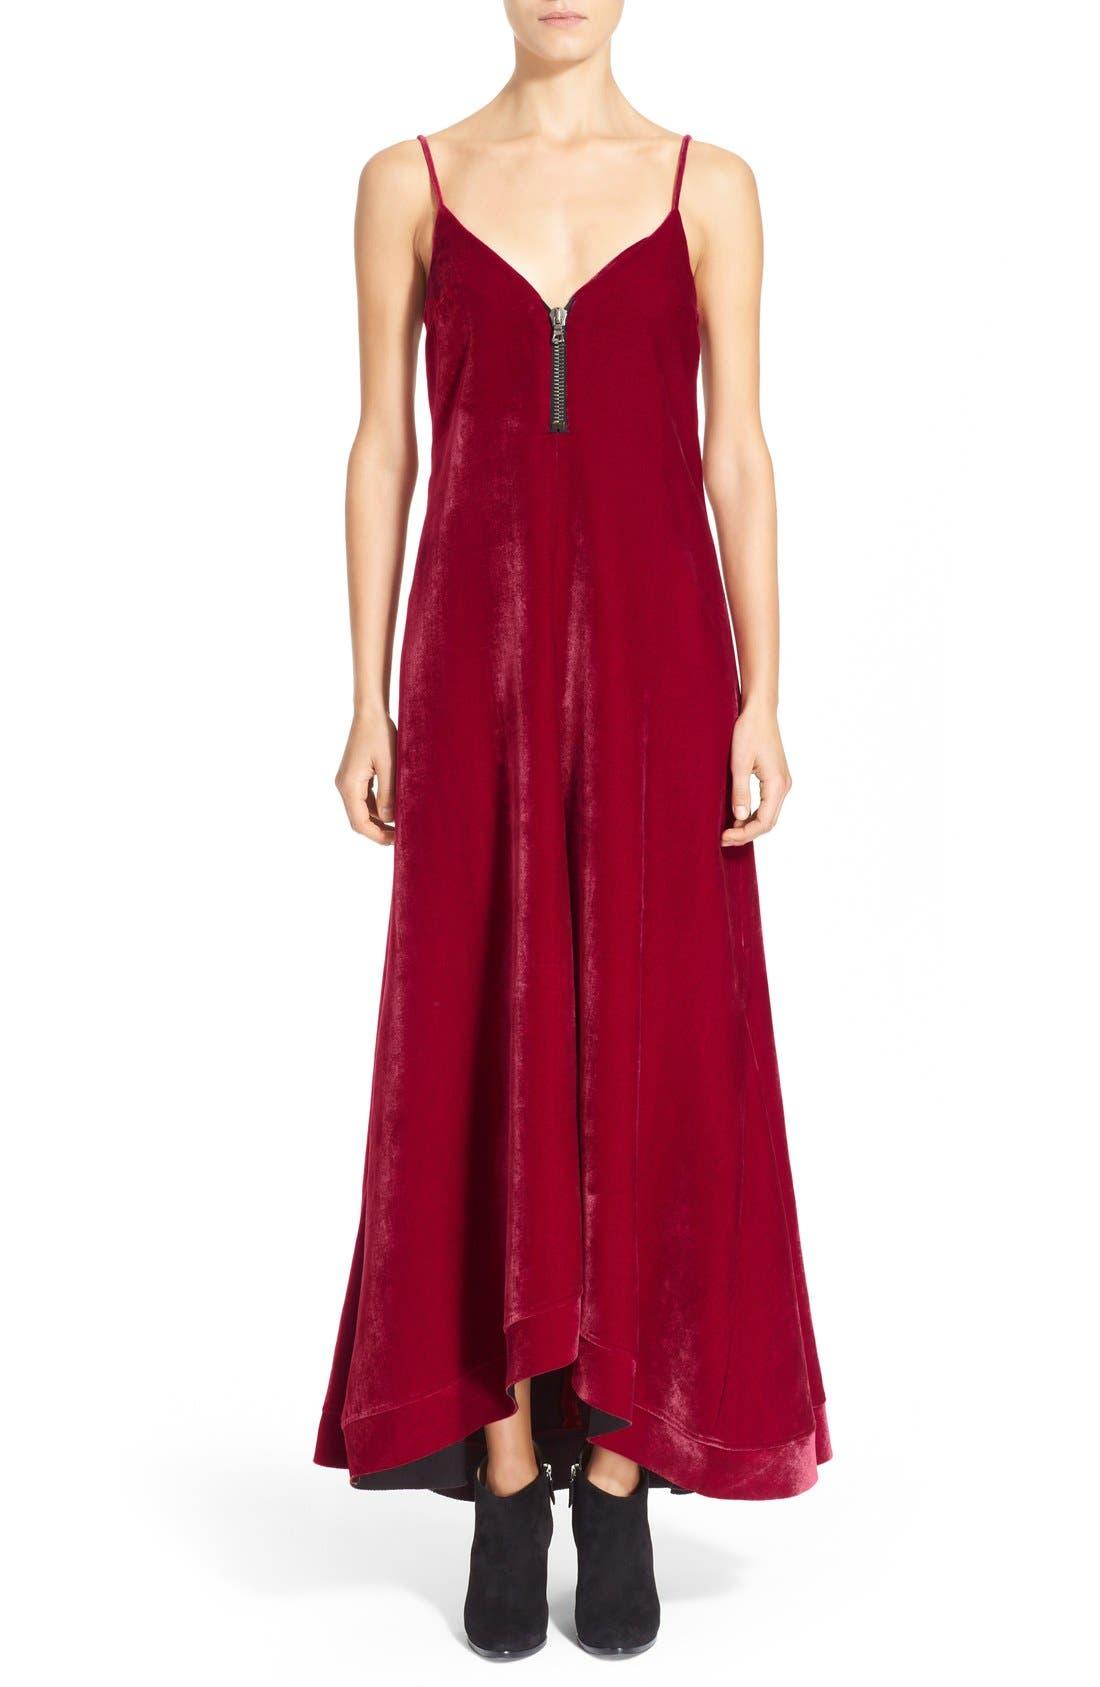 Alternate Image 1 Selected - ELLERY 'Roulette' A-Line Dress